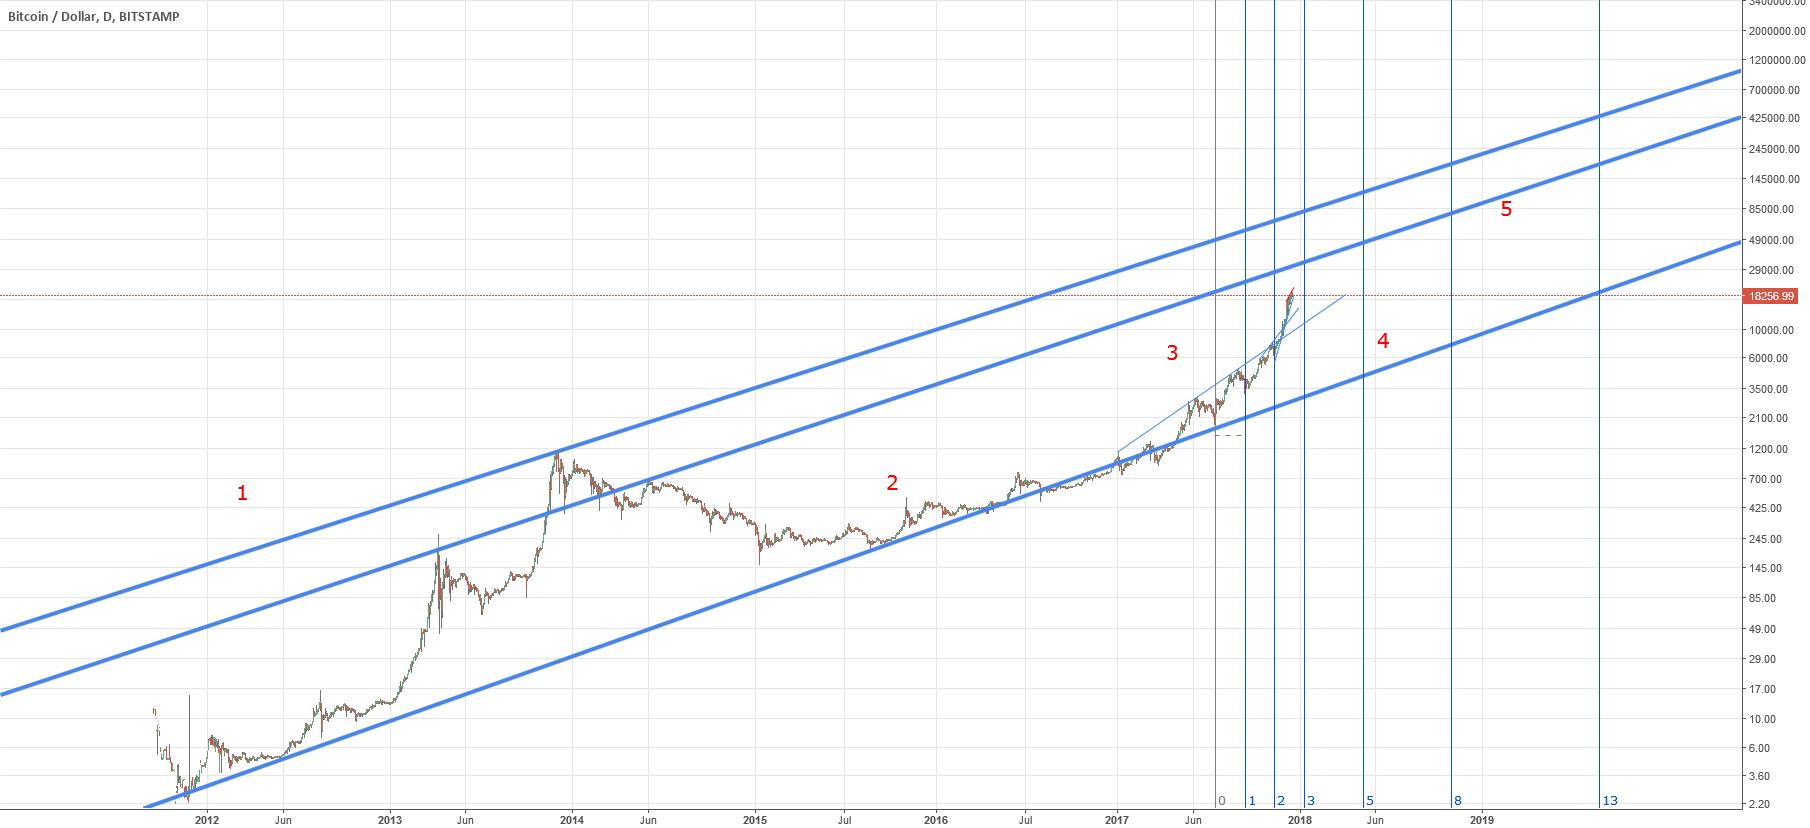 BTCUSD, very long term view